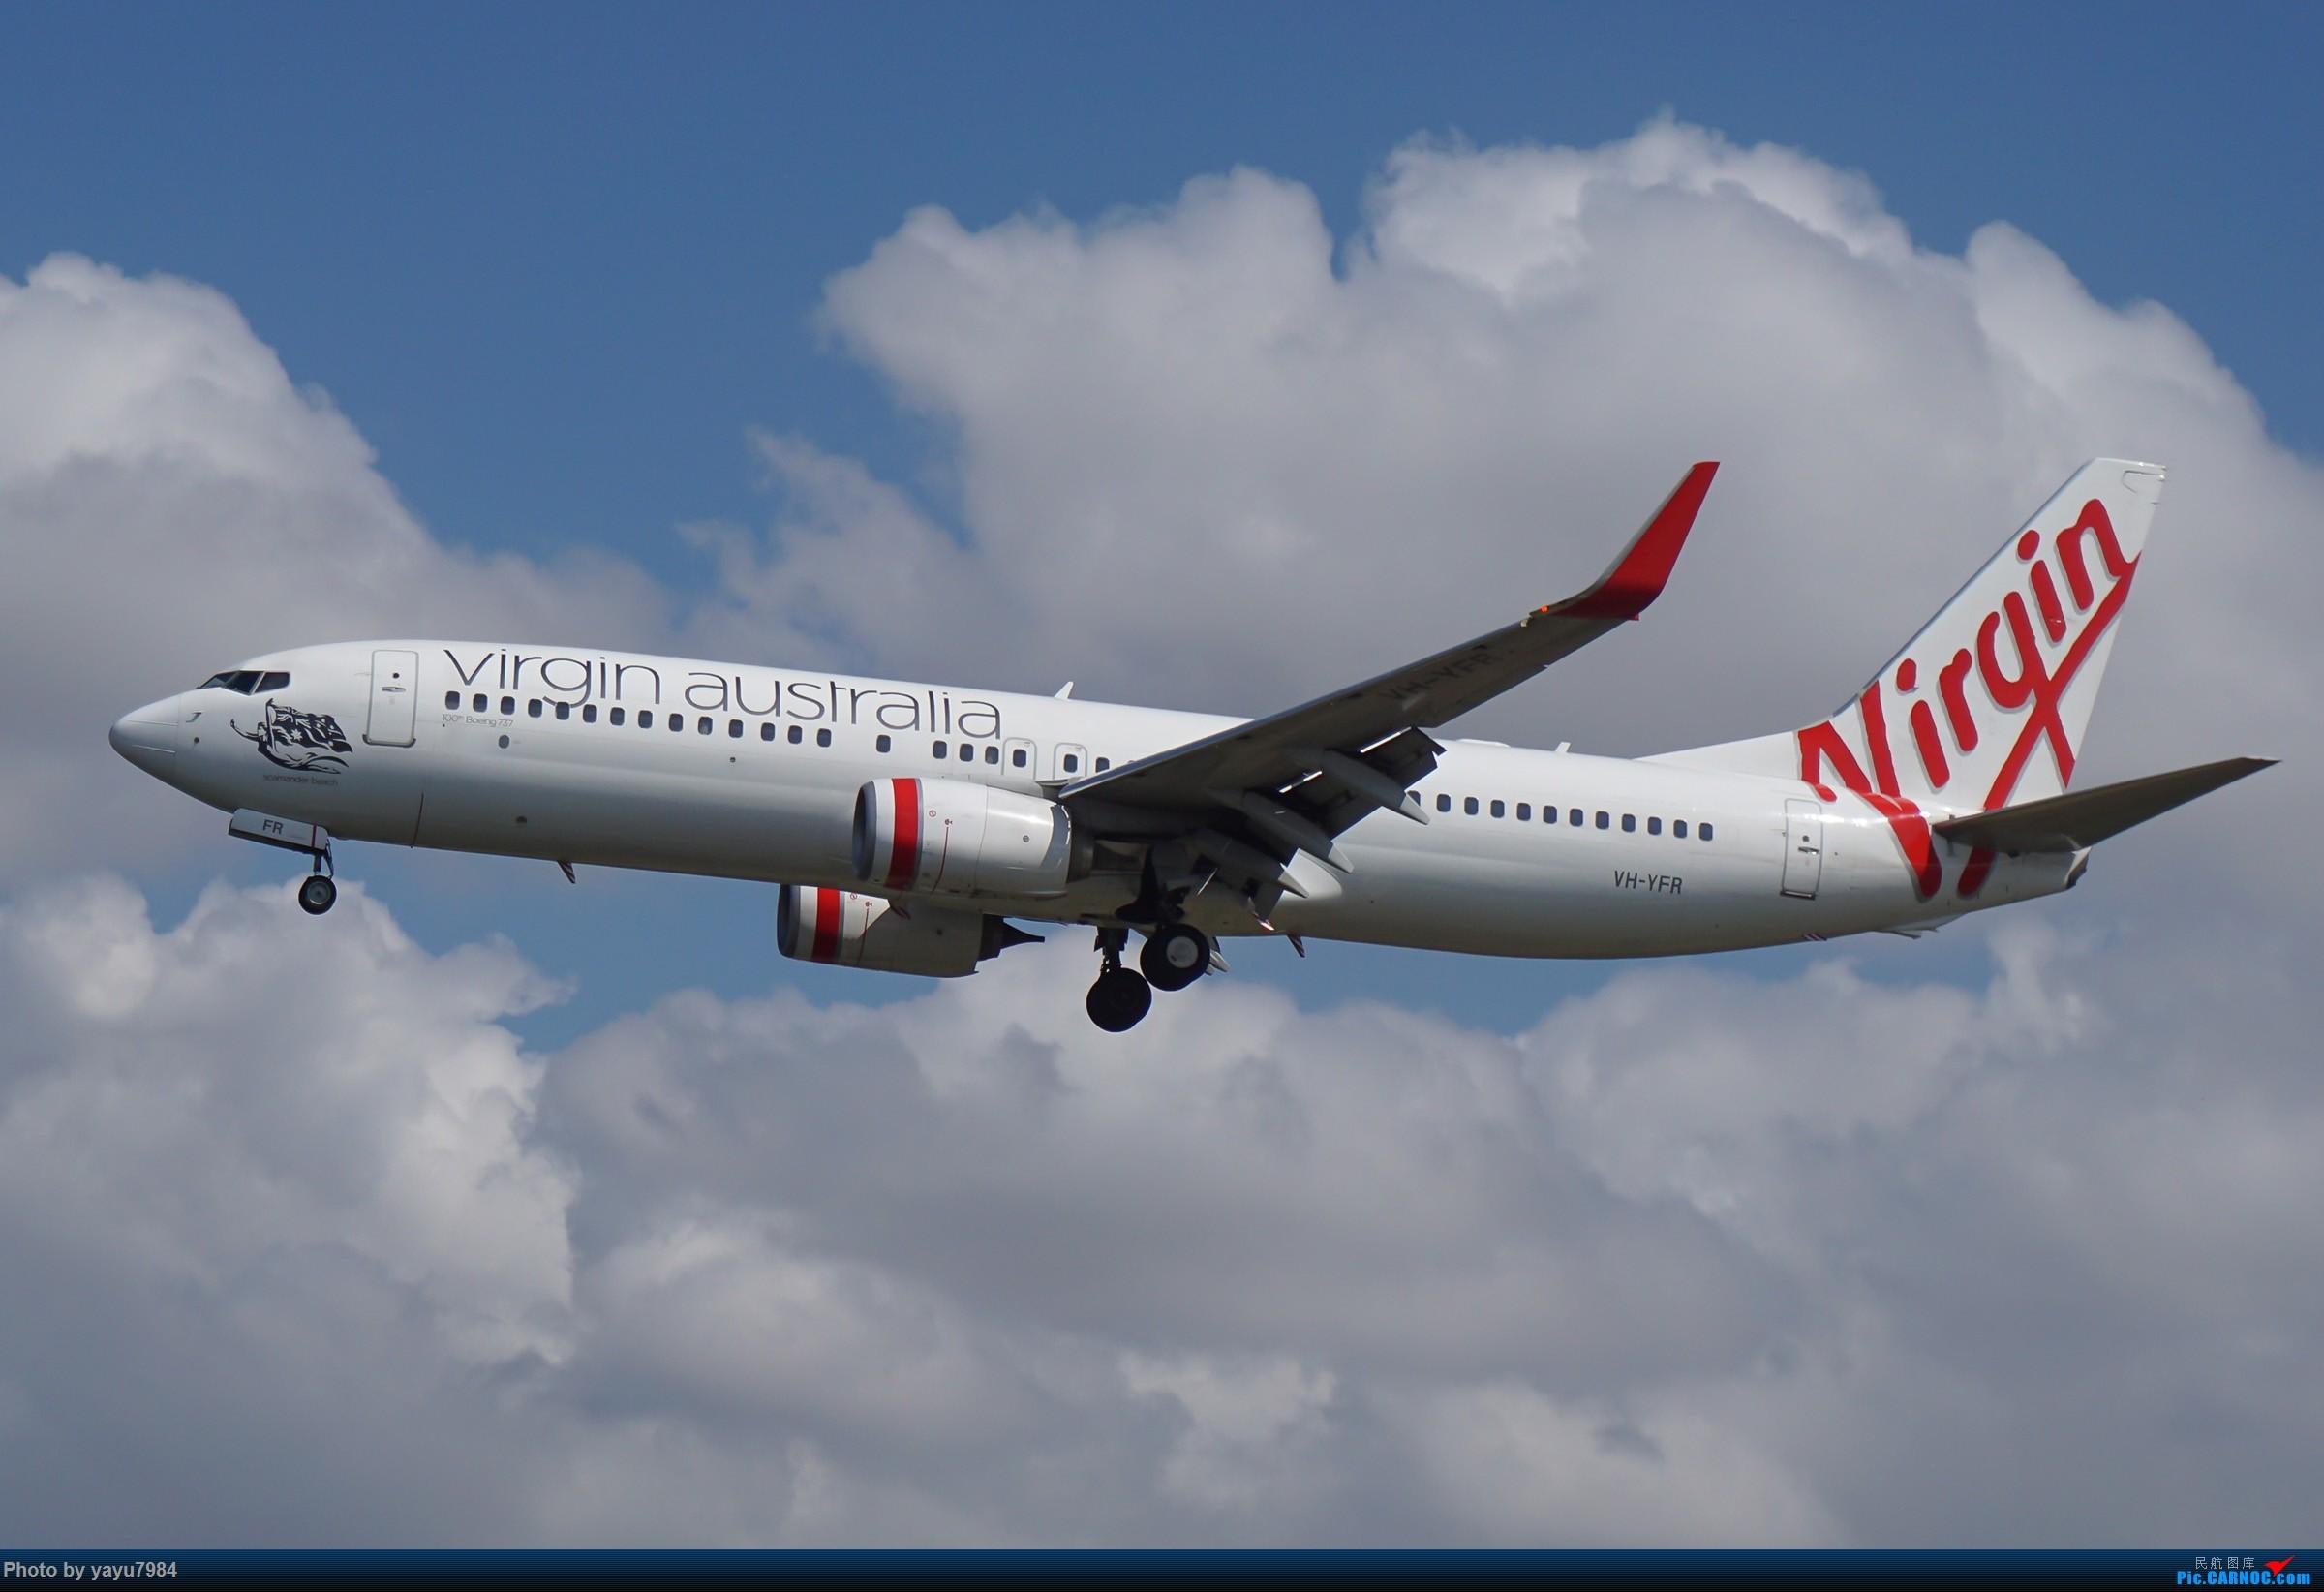 Re:[原创][SYD] 东航天合332,雪绒花343,华航蓝鹊,以及其他日常货 BOEING 737-800 VH-YFR 澳大利亚悉尼金斯福德·史密斯机场